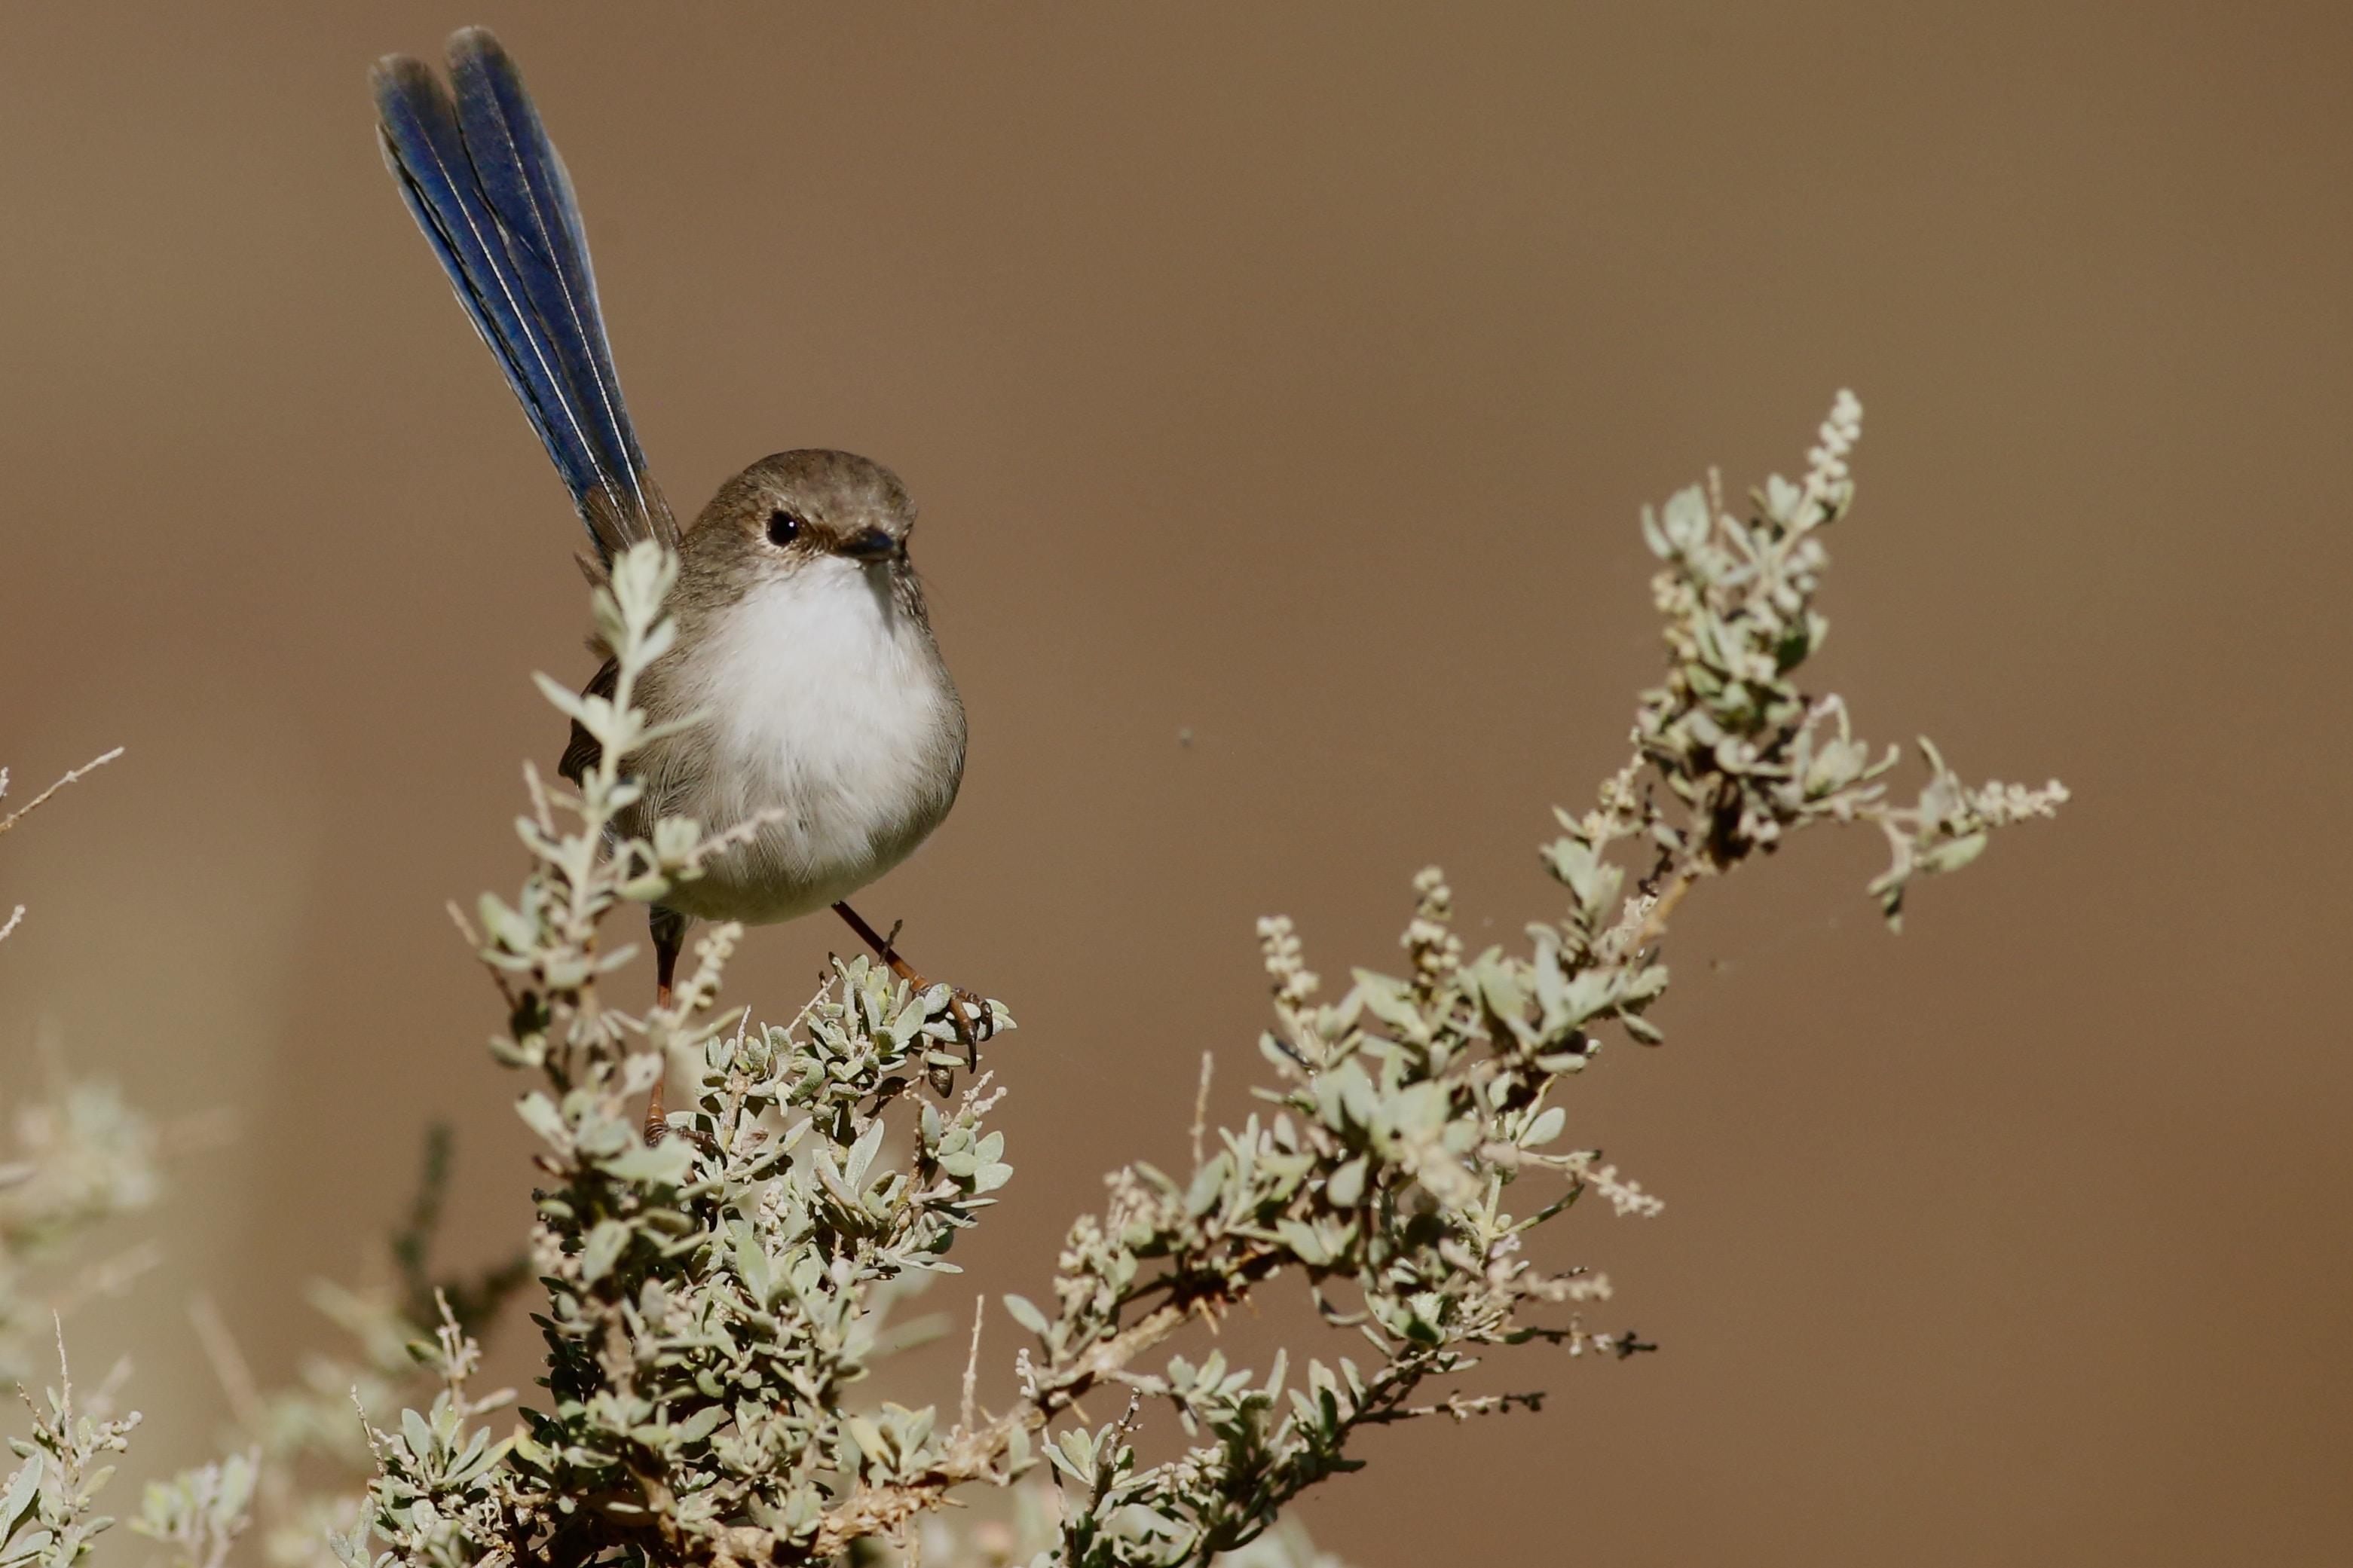 close up photography of brown bird